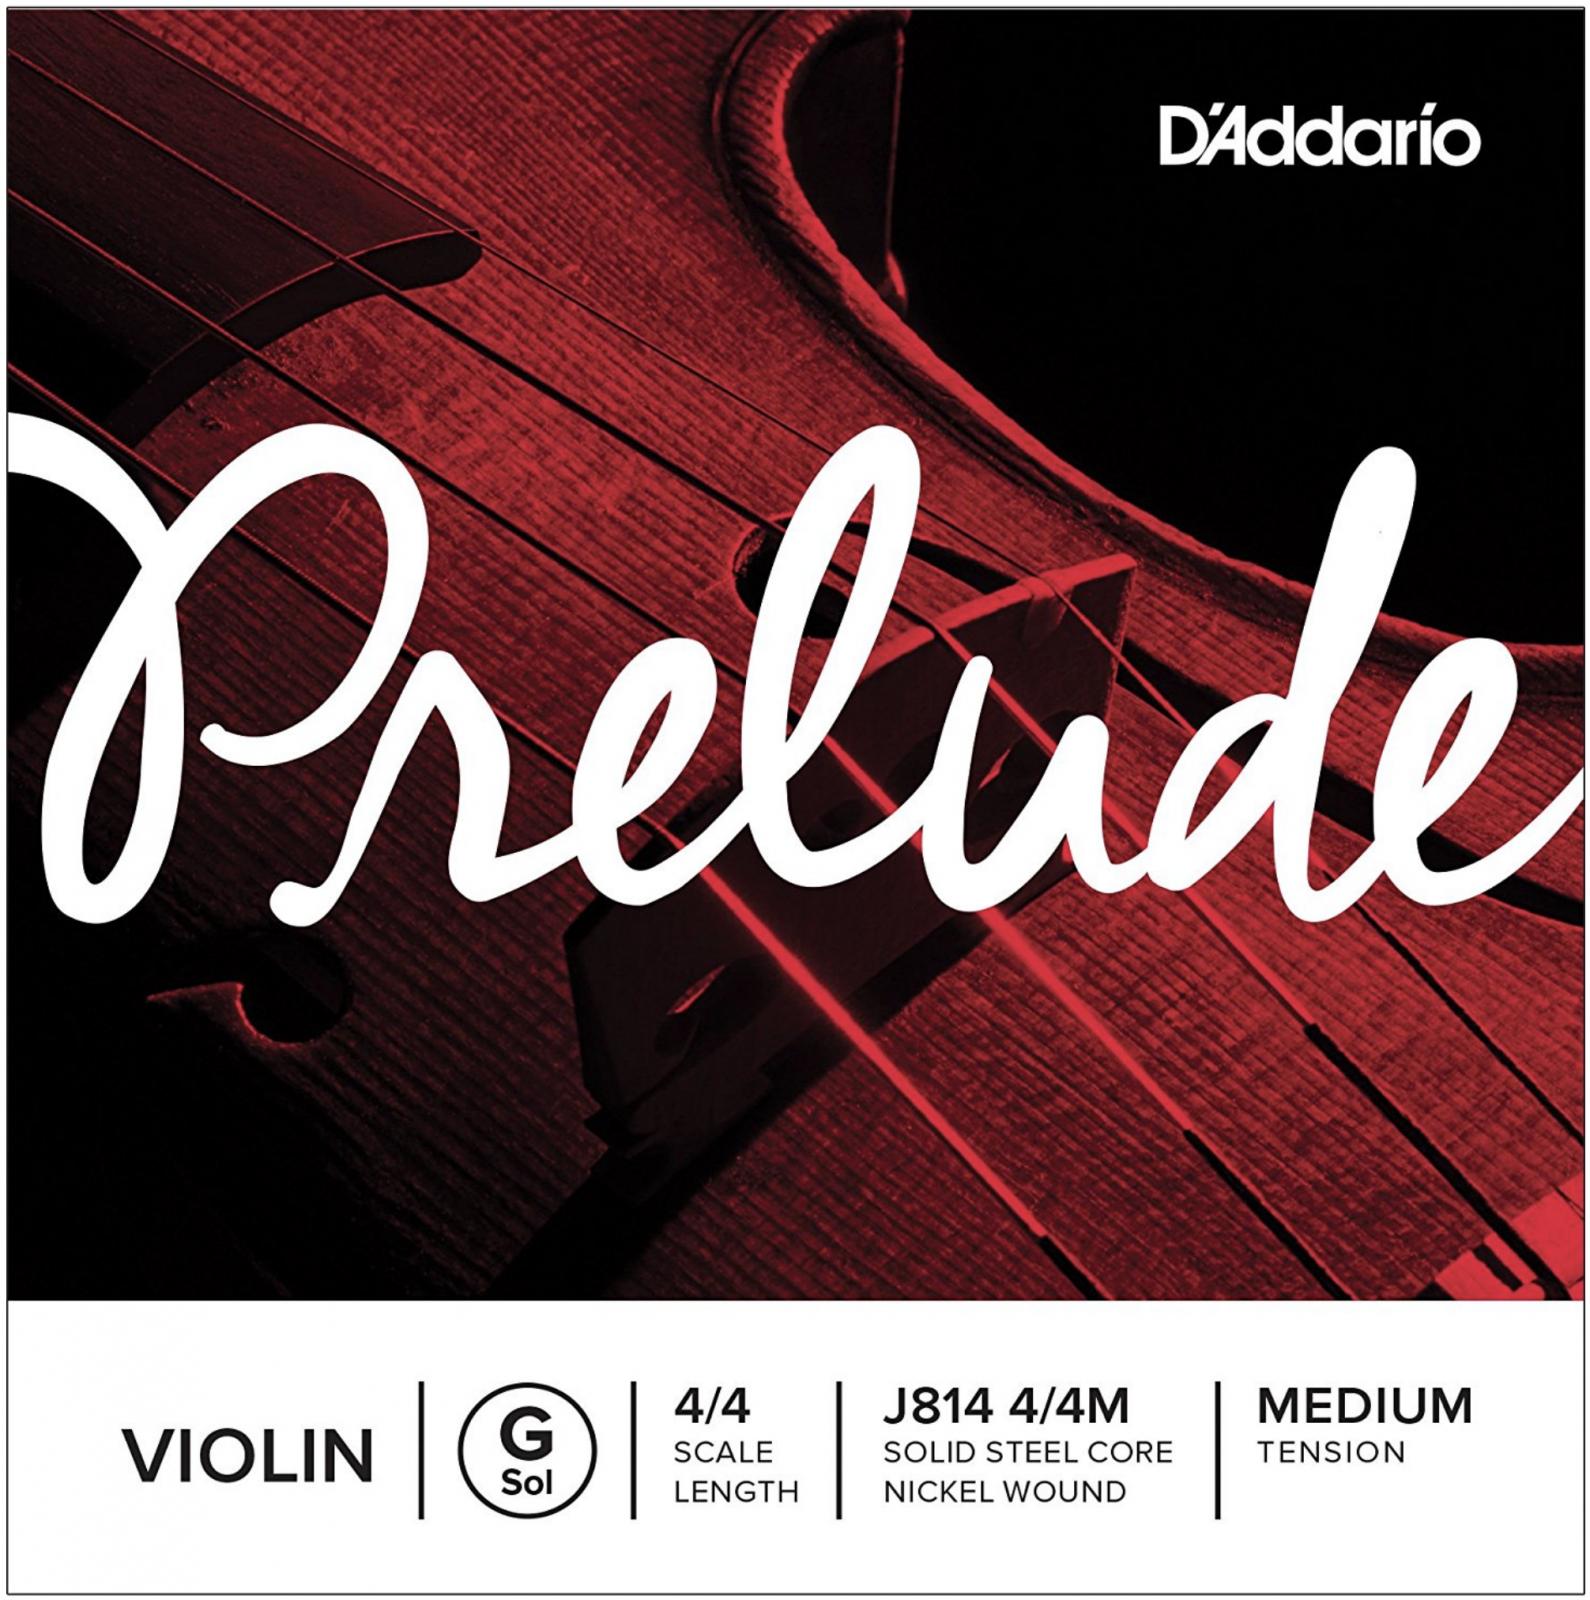 Violin String (G) | D'Addario Prelude